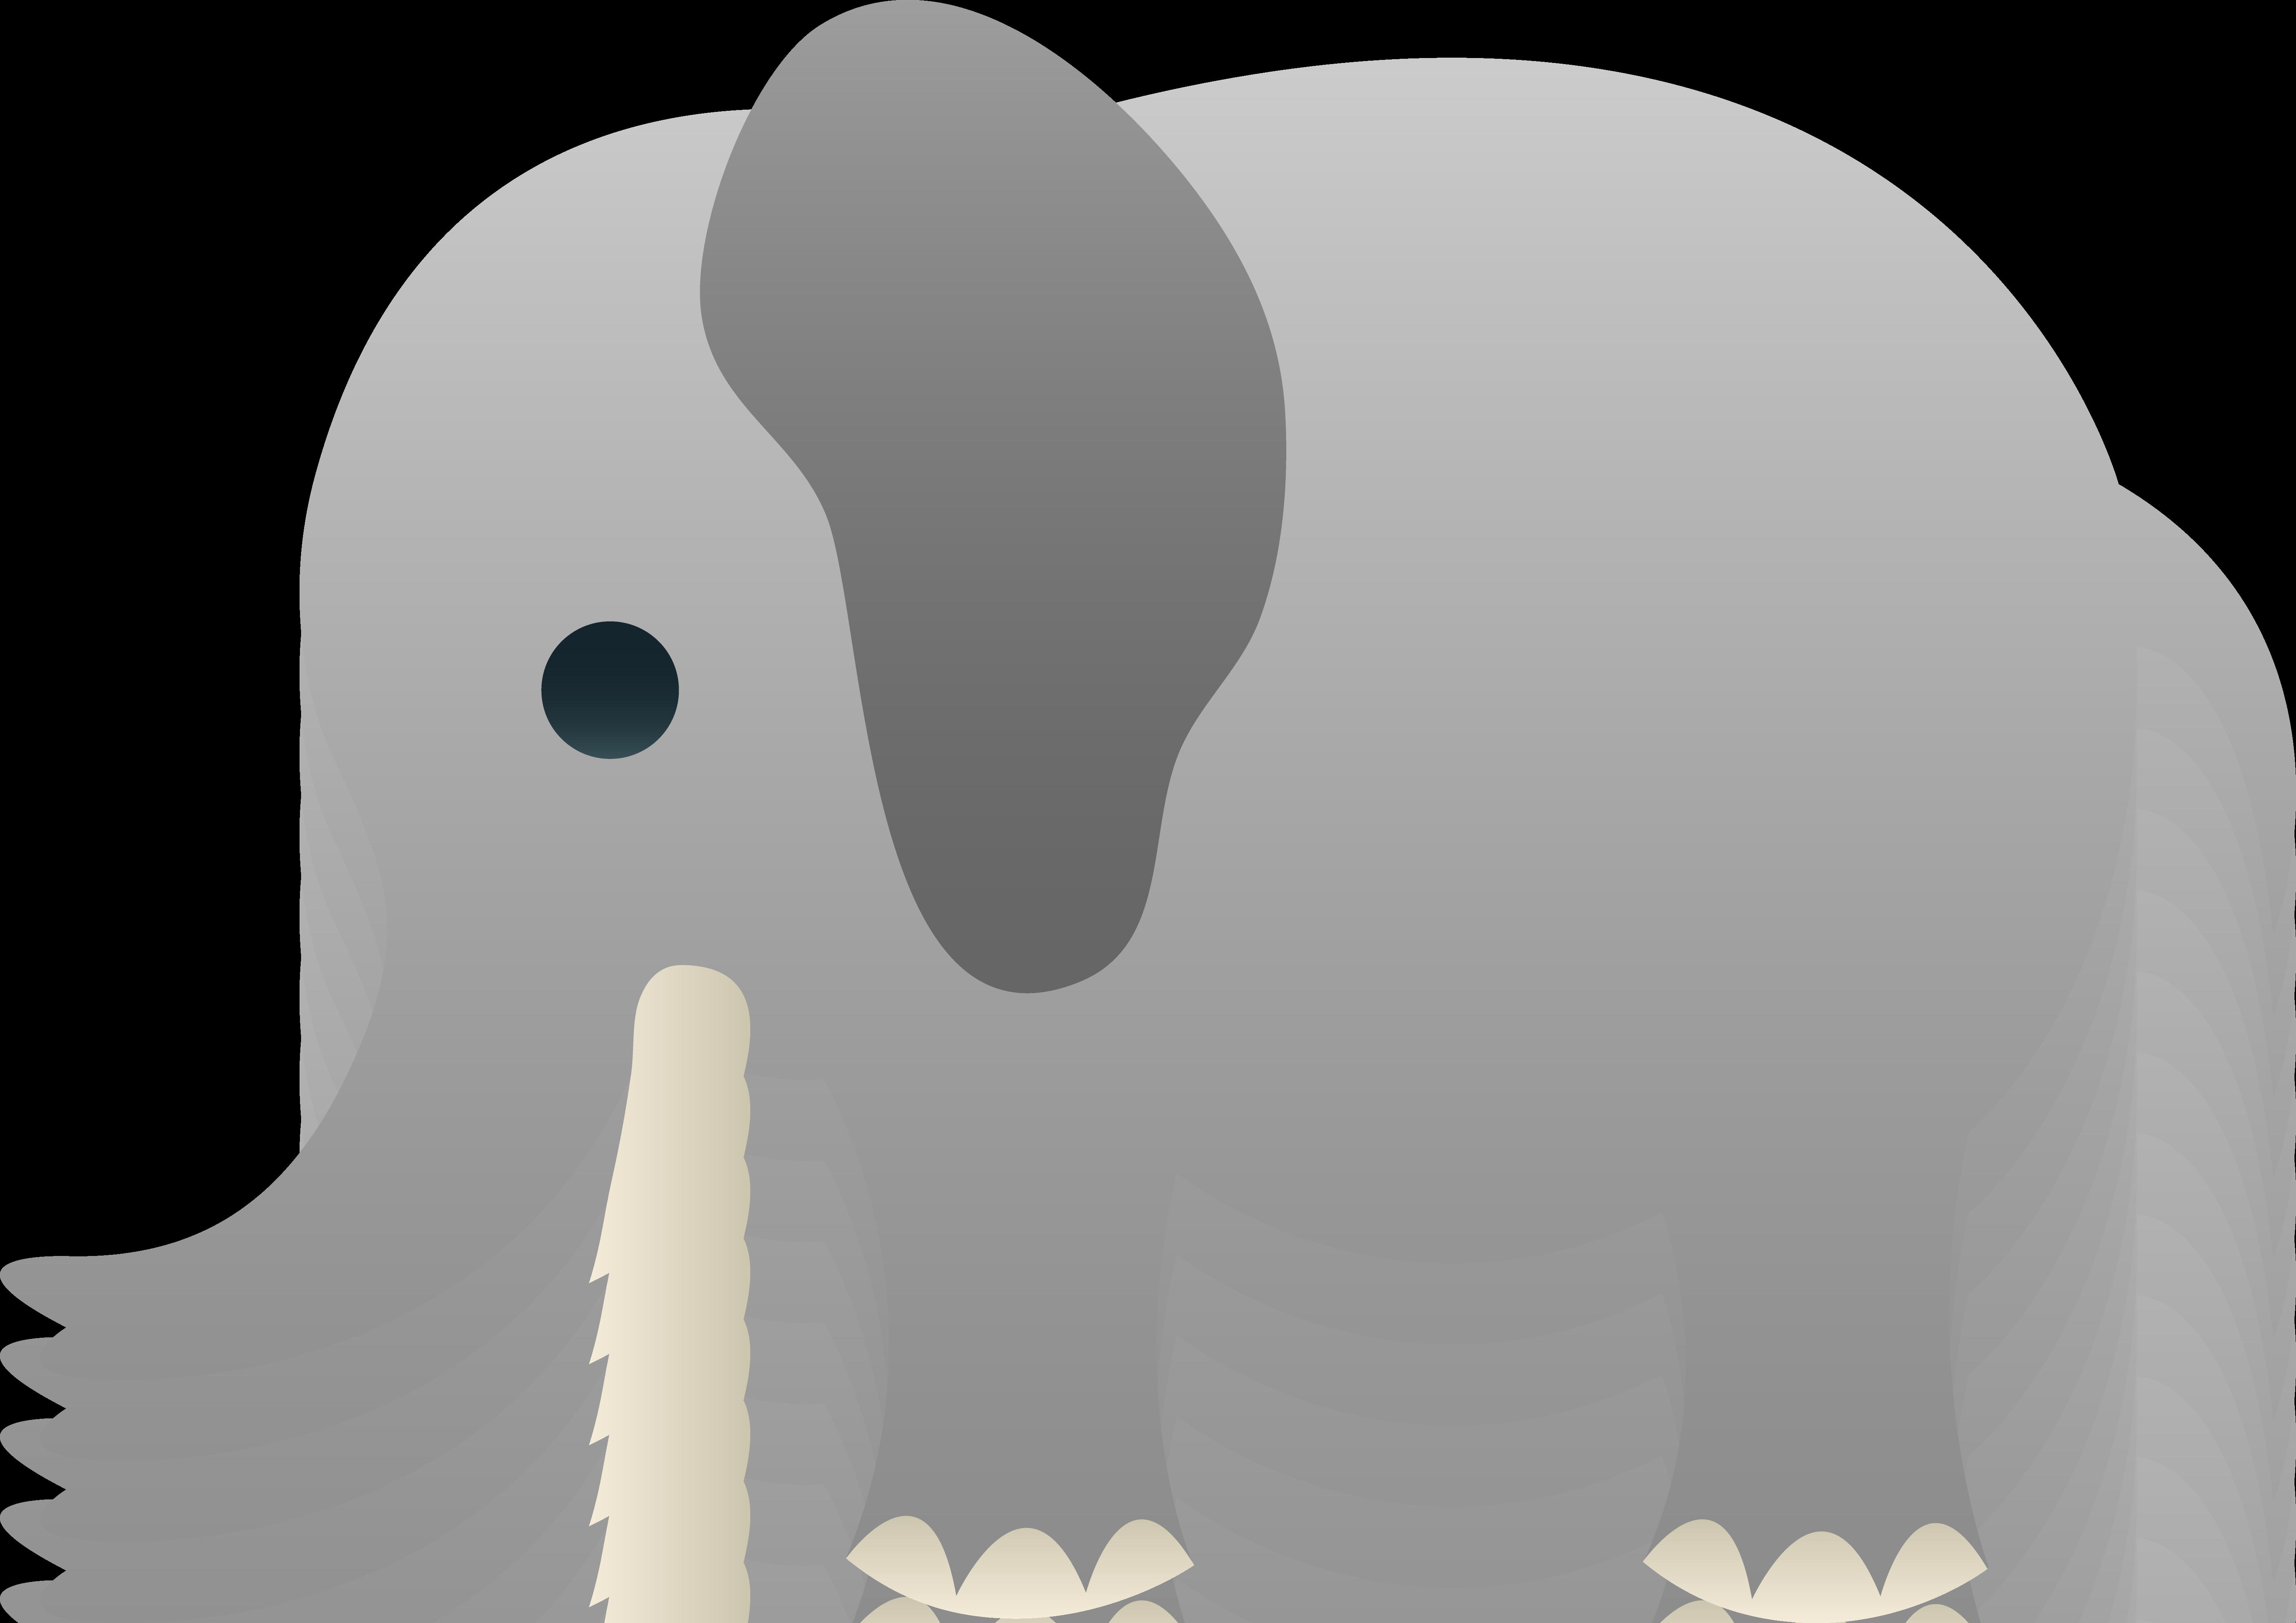 Cute Little Elephant Clip Art | Baby clip art, Elephant ...